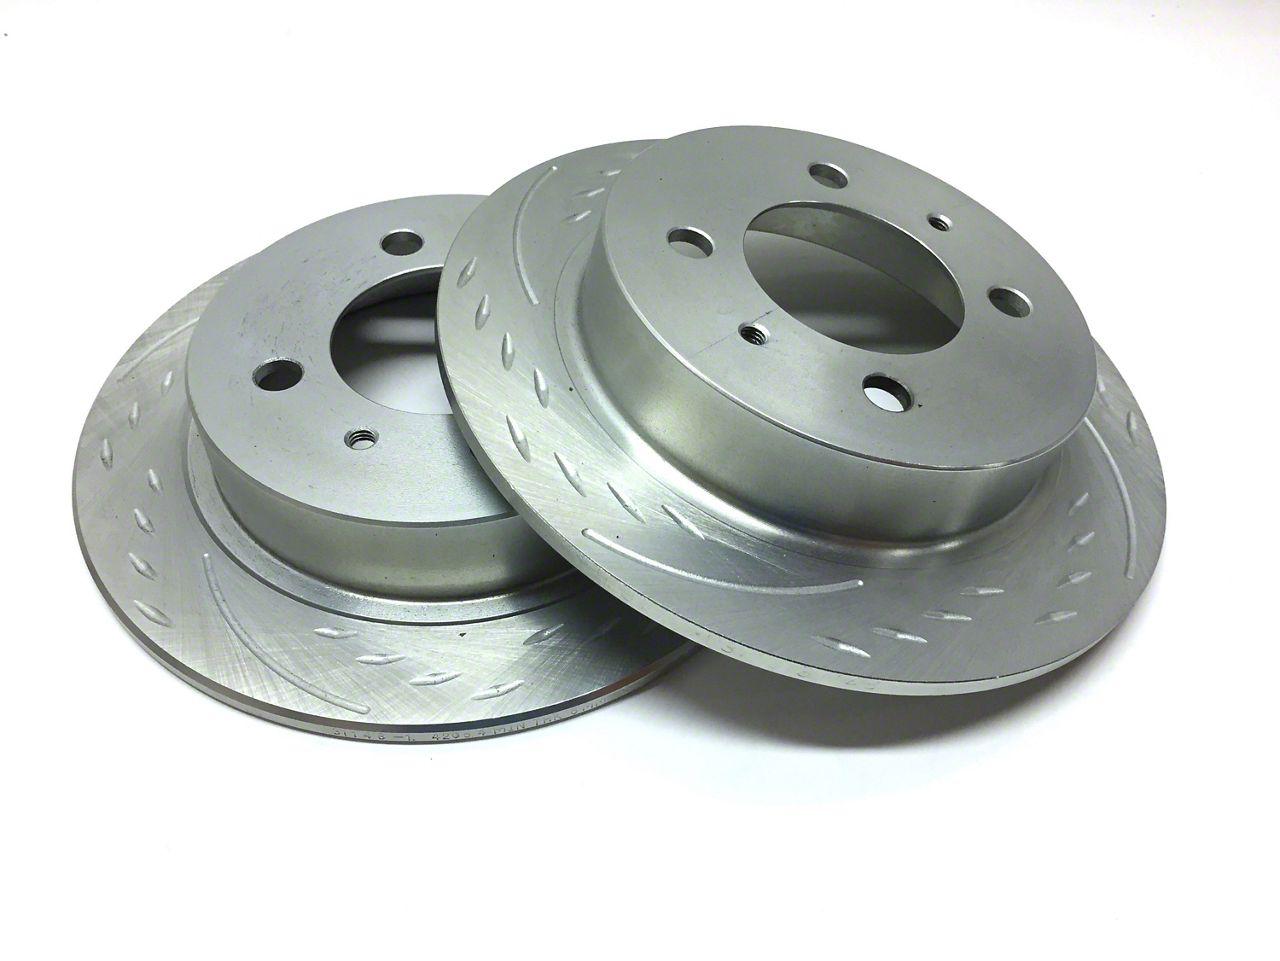 SP Performance Diamond Slot Rotors w/ Silver Zinc Plating - Rear Pair (07-18 Jeep Wrangler JK)